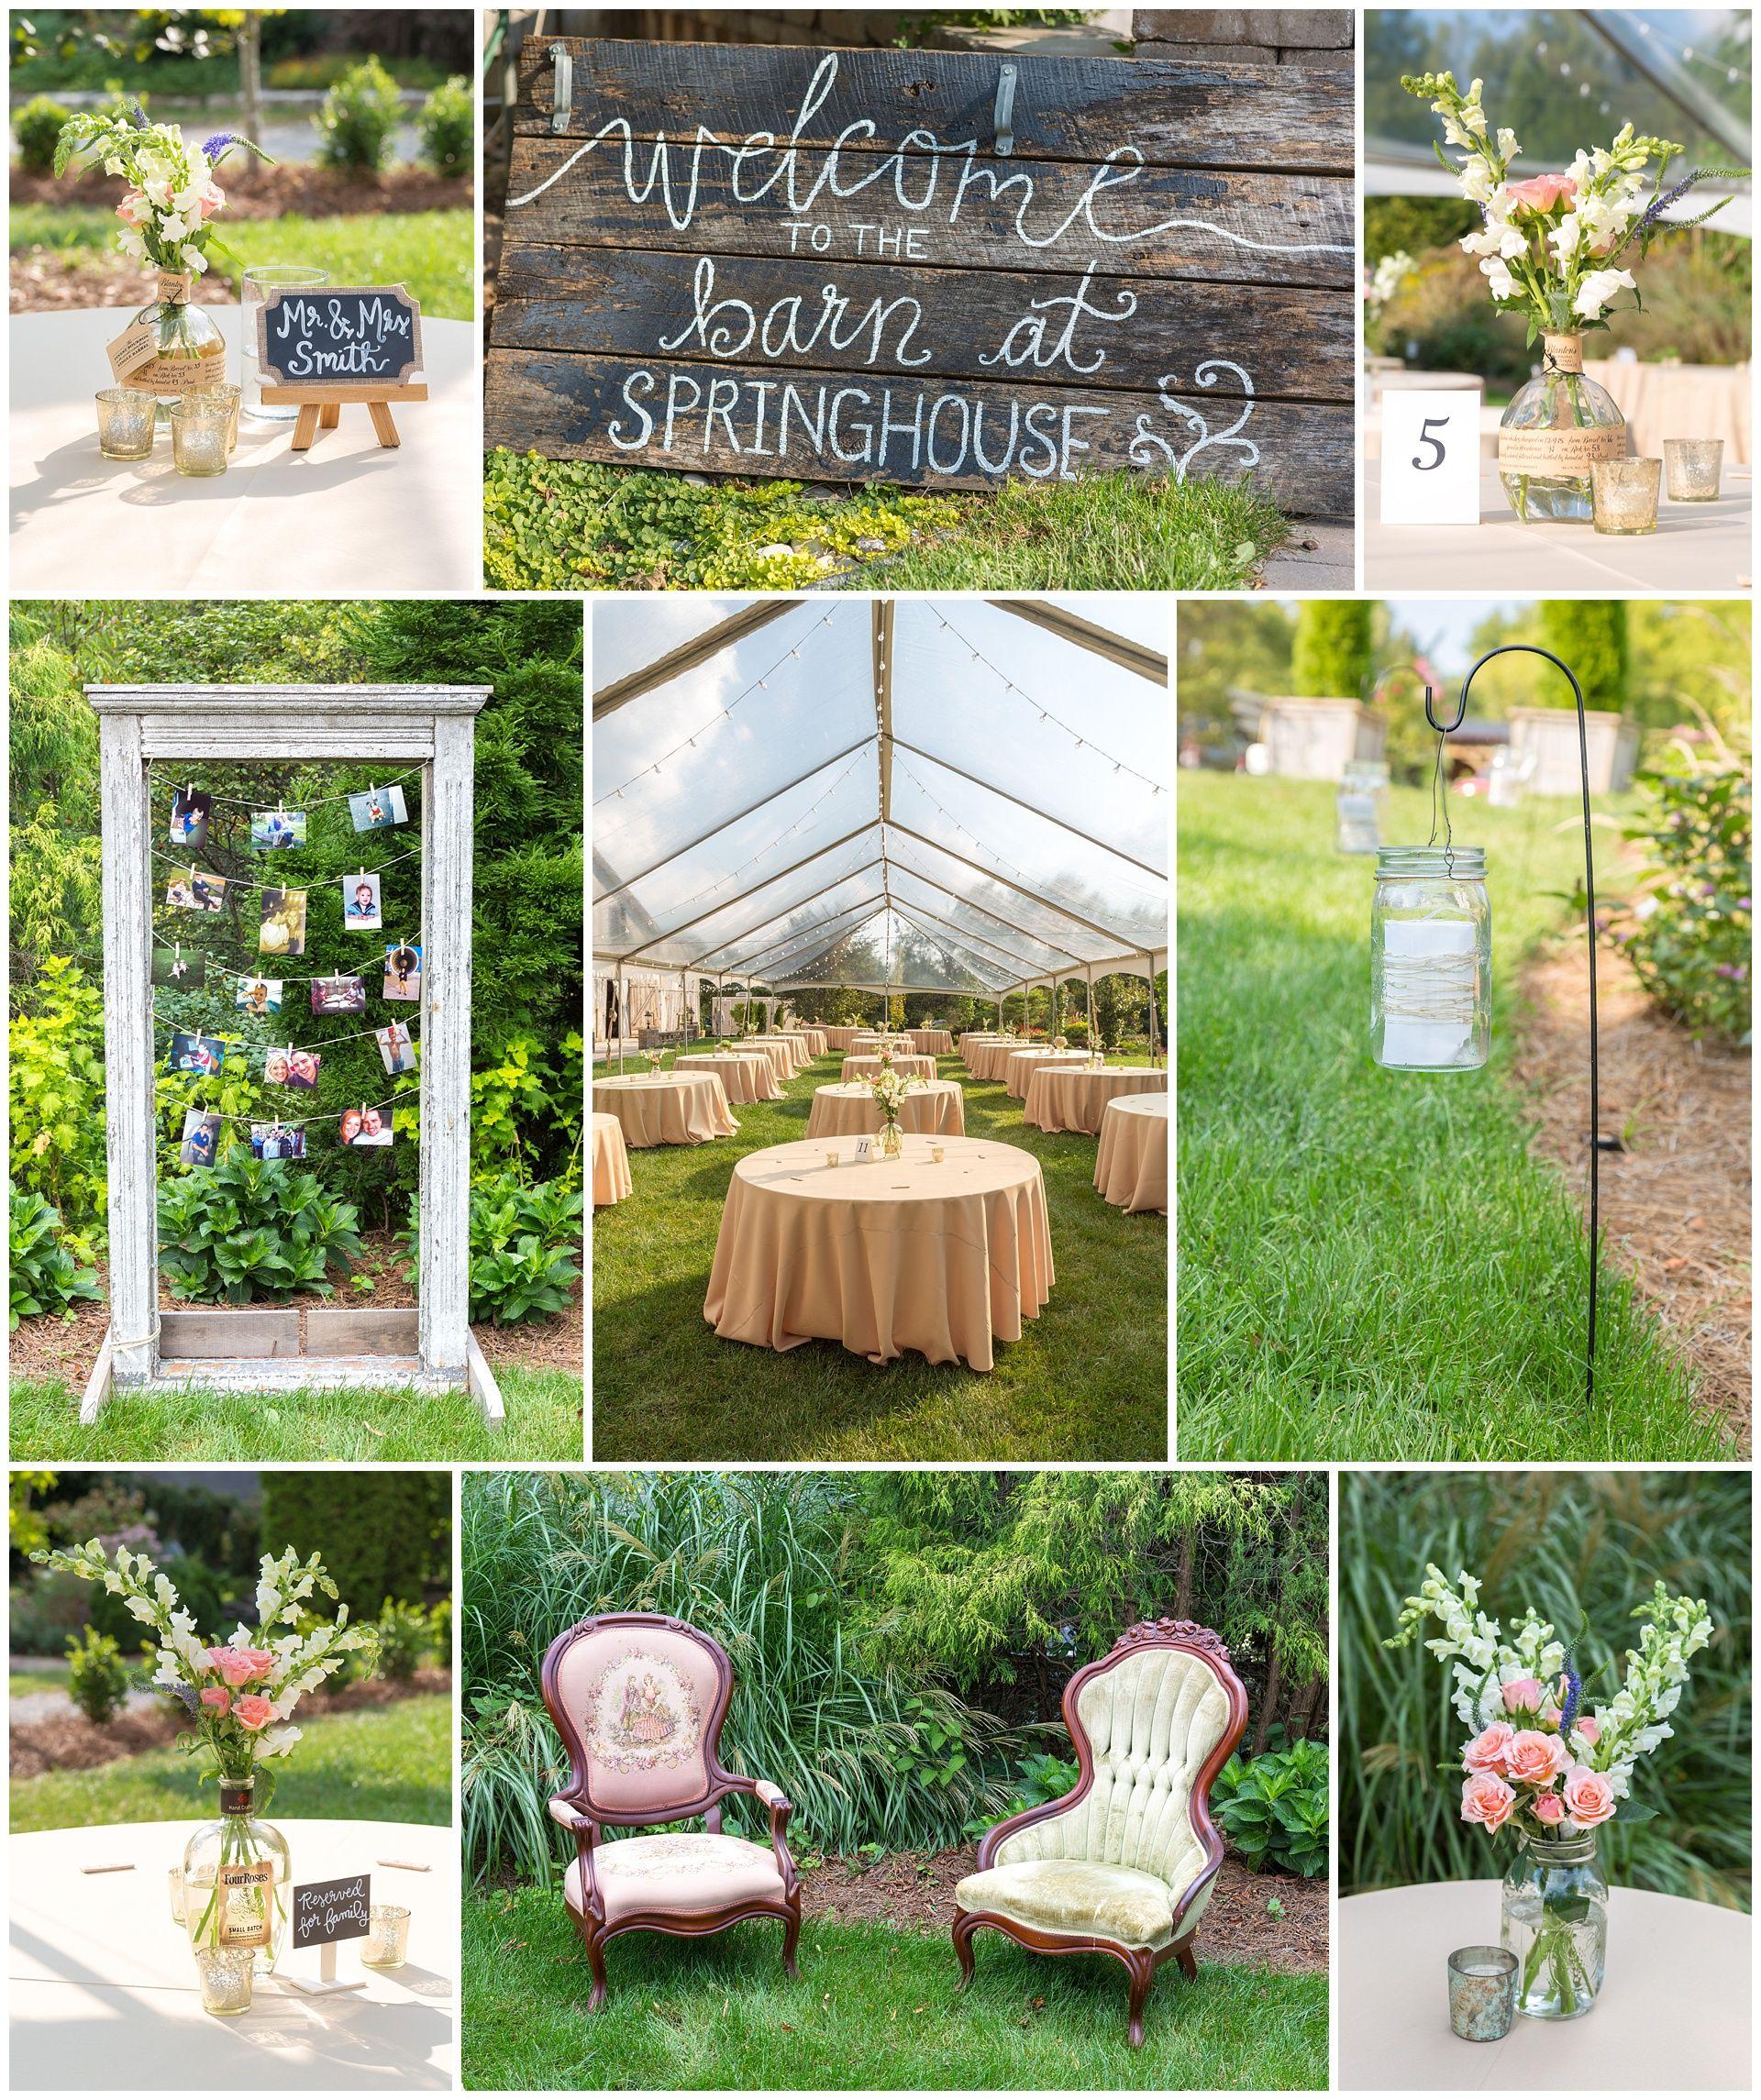 Kevin And Anna Photography Wedding Reception Detail Photos At The Barn Springhouse Gardens In Lexington Kentucky Southern